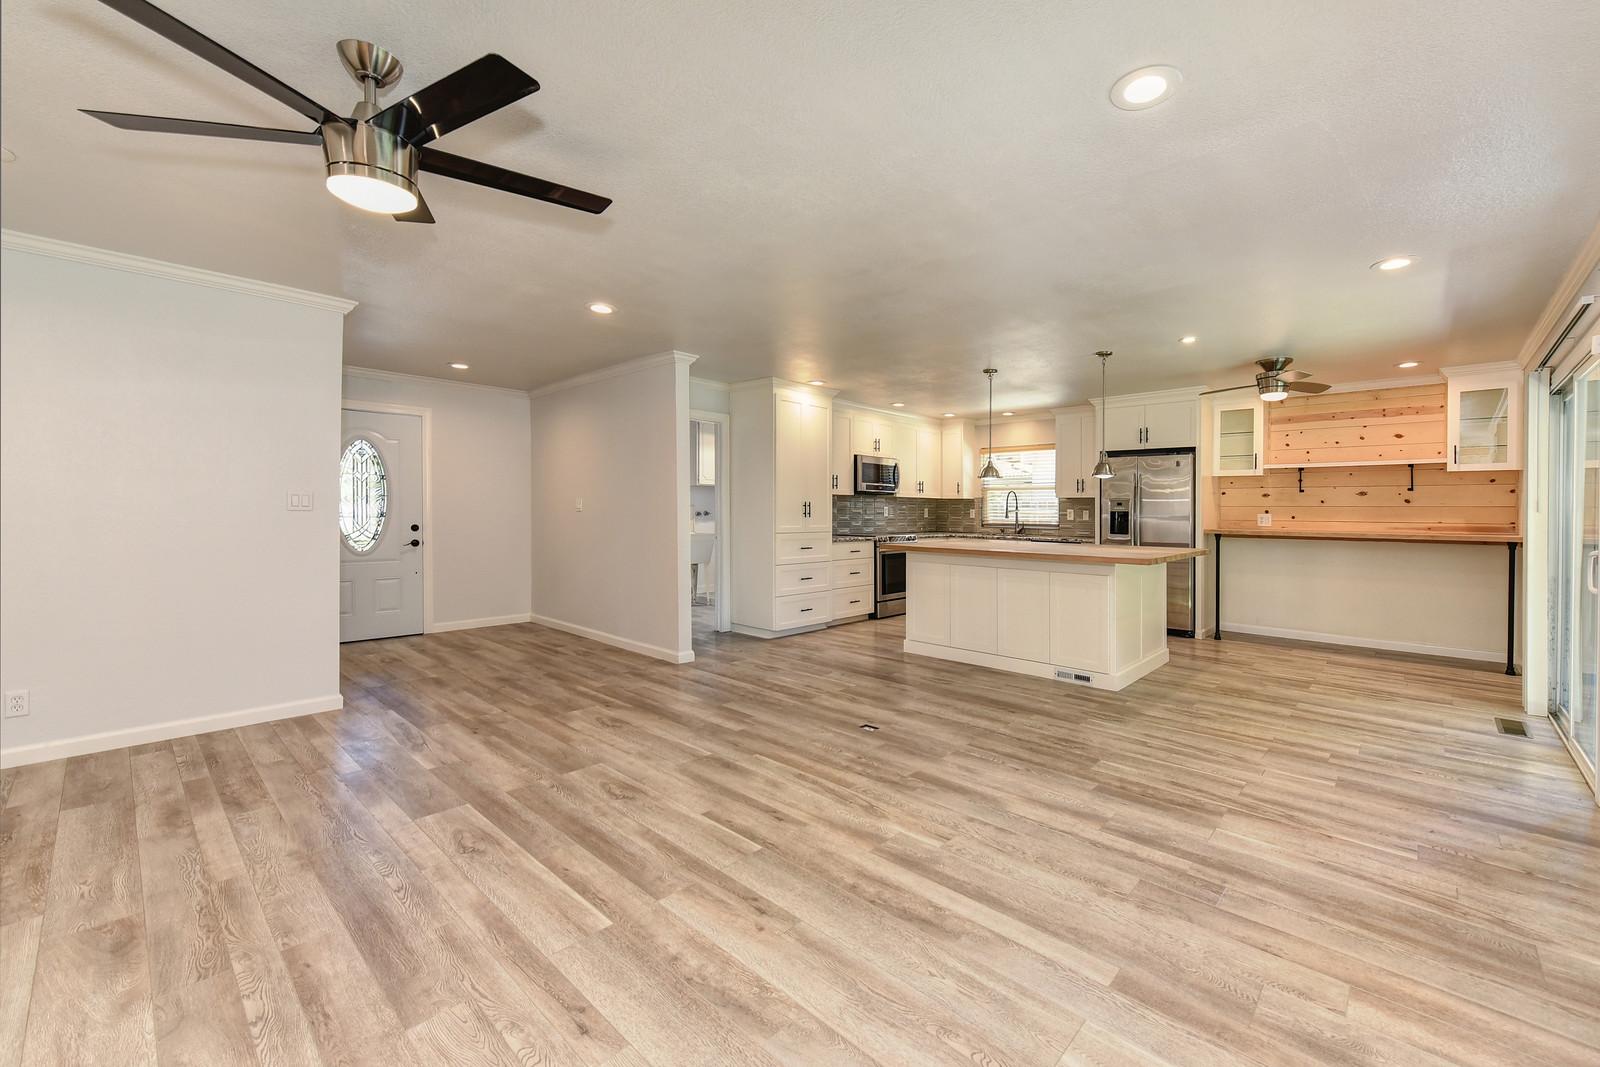 5342 Nyoda Way Living Room | Realtor in Carmichael California